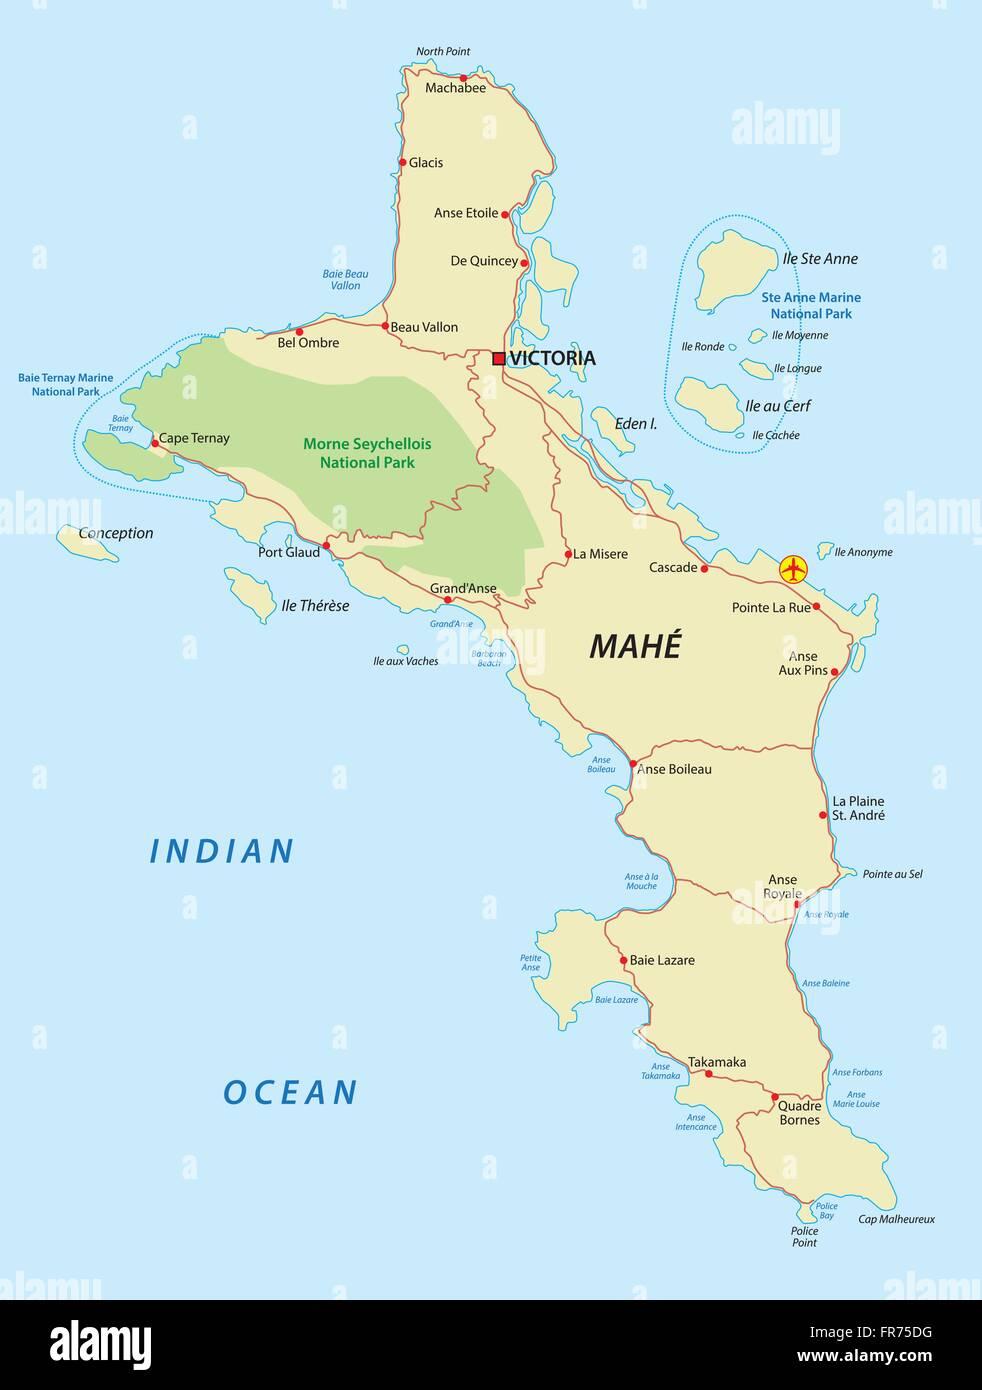 Karte Seychellen.Seychellen Mahe Karte Vektor Abbildung Bild 100346892